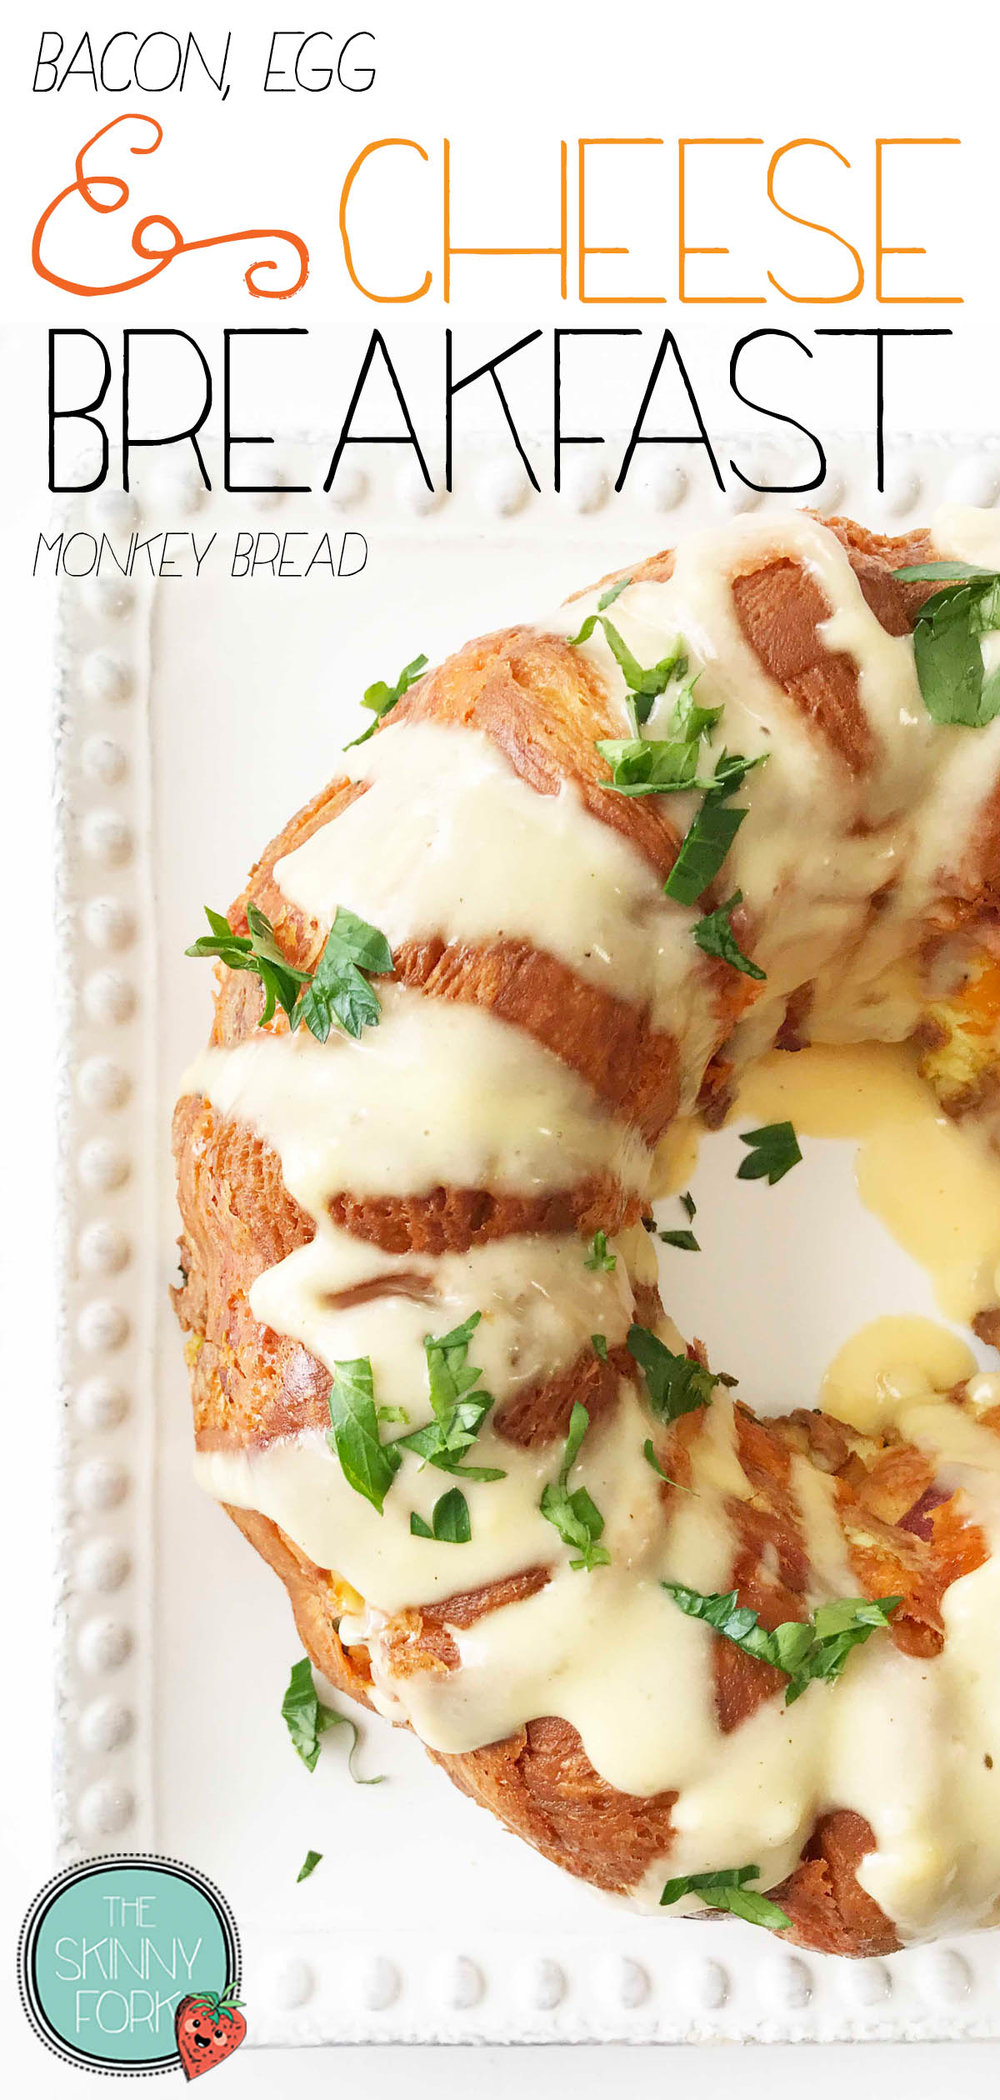 bacon-egg-cheese-monkey-bread-pin.jpg